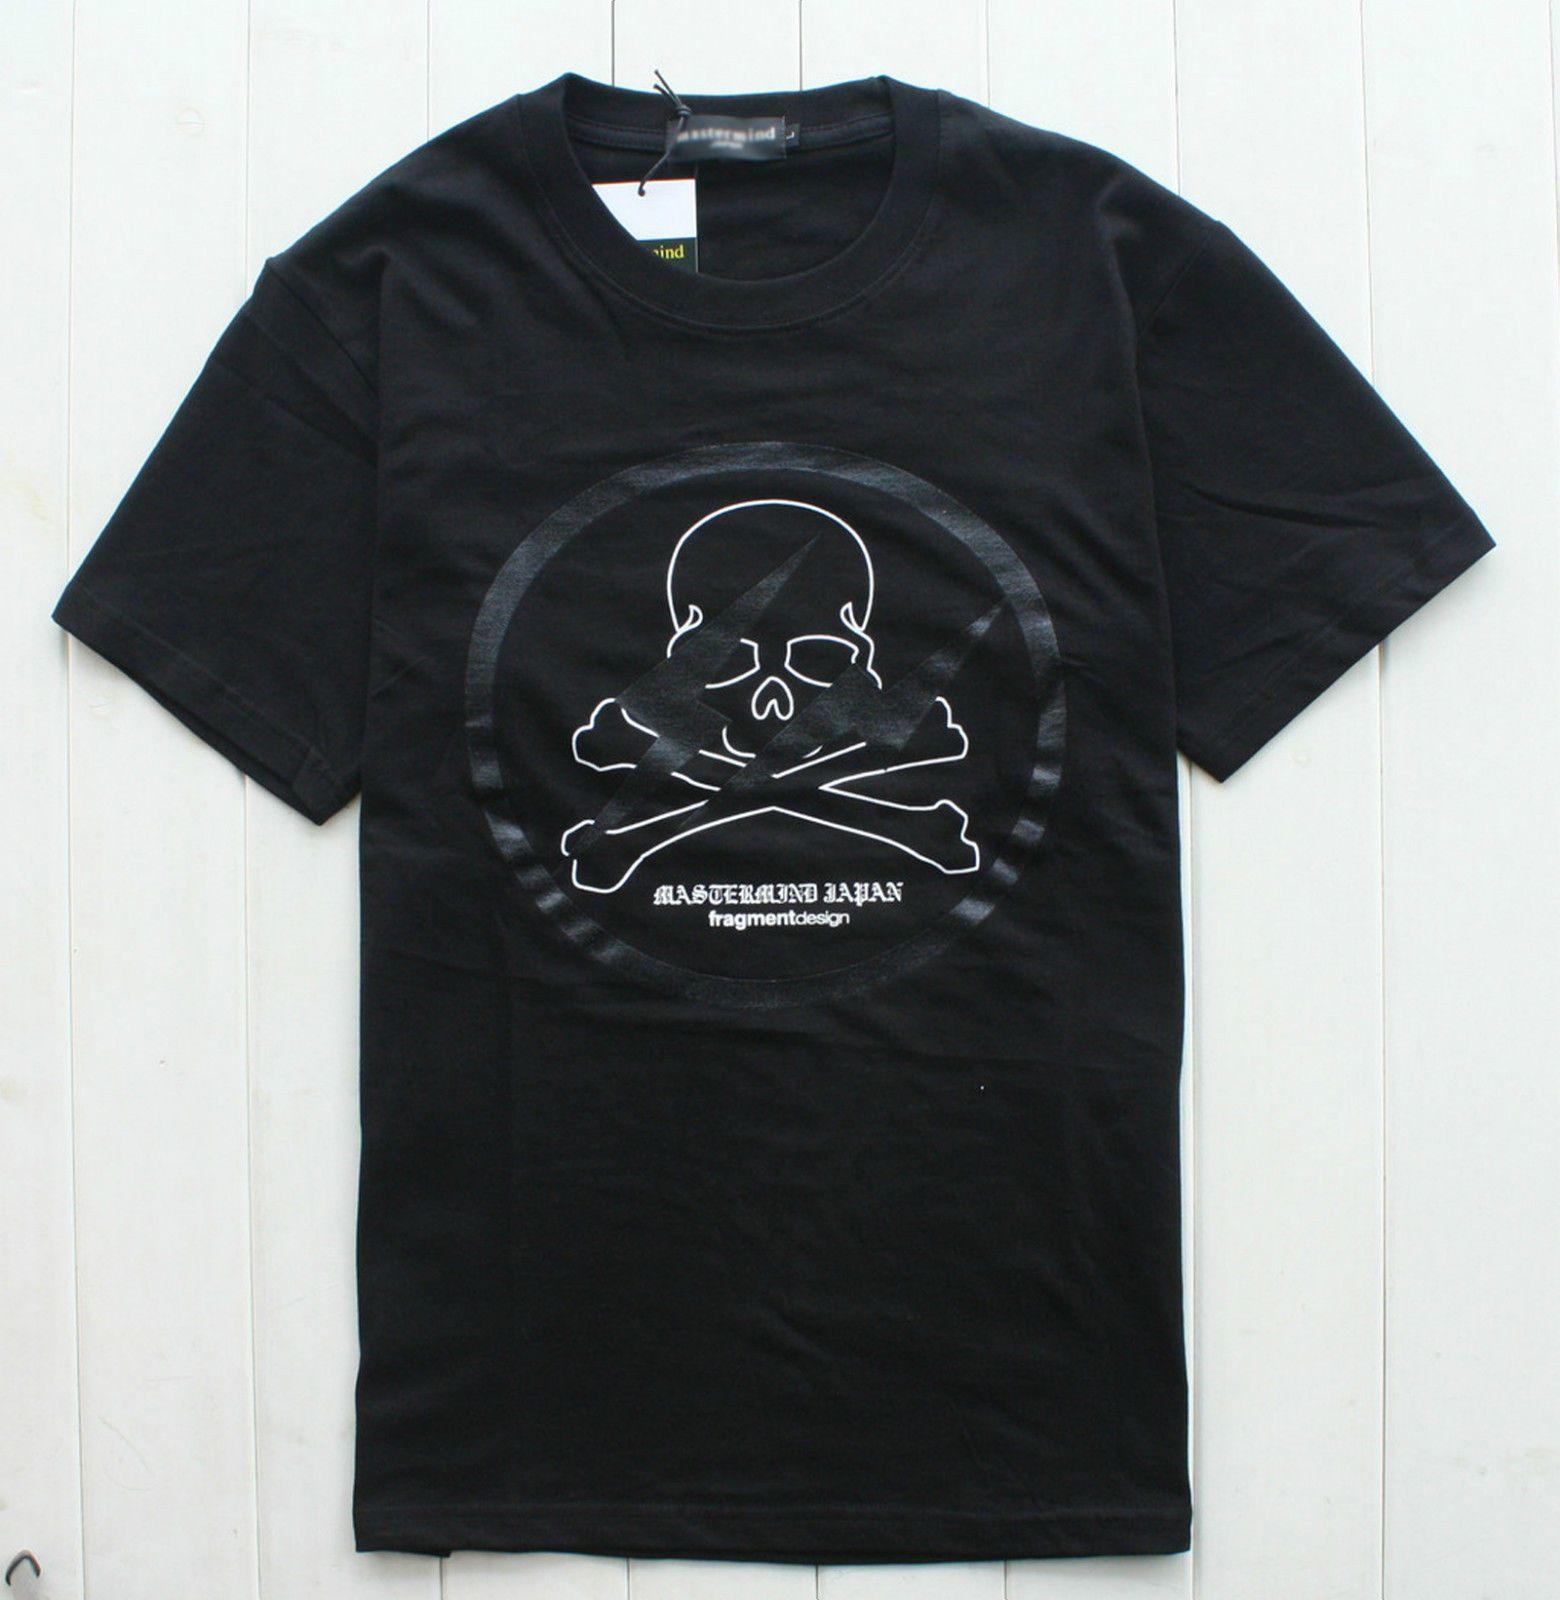 Mastermind Japan MMJ x Fragment Lightning Graphic Cutton Tee Shirt 3 Sz Black | eBay